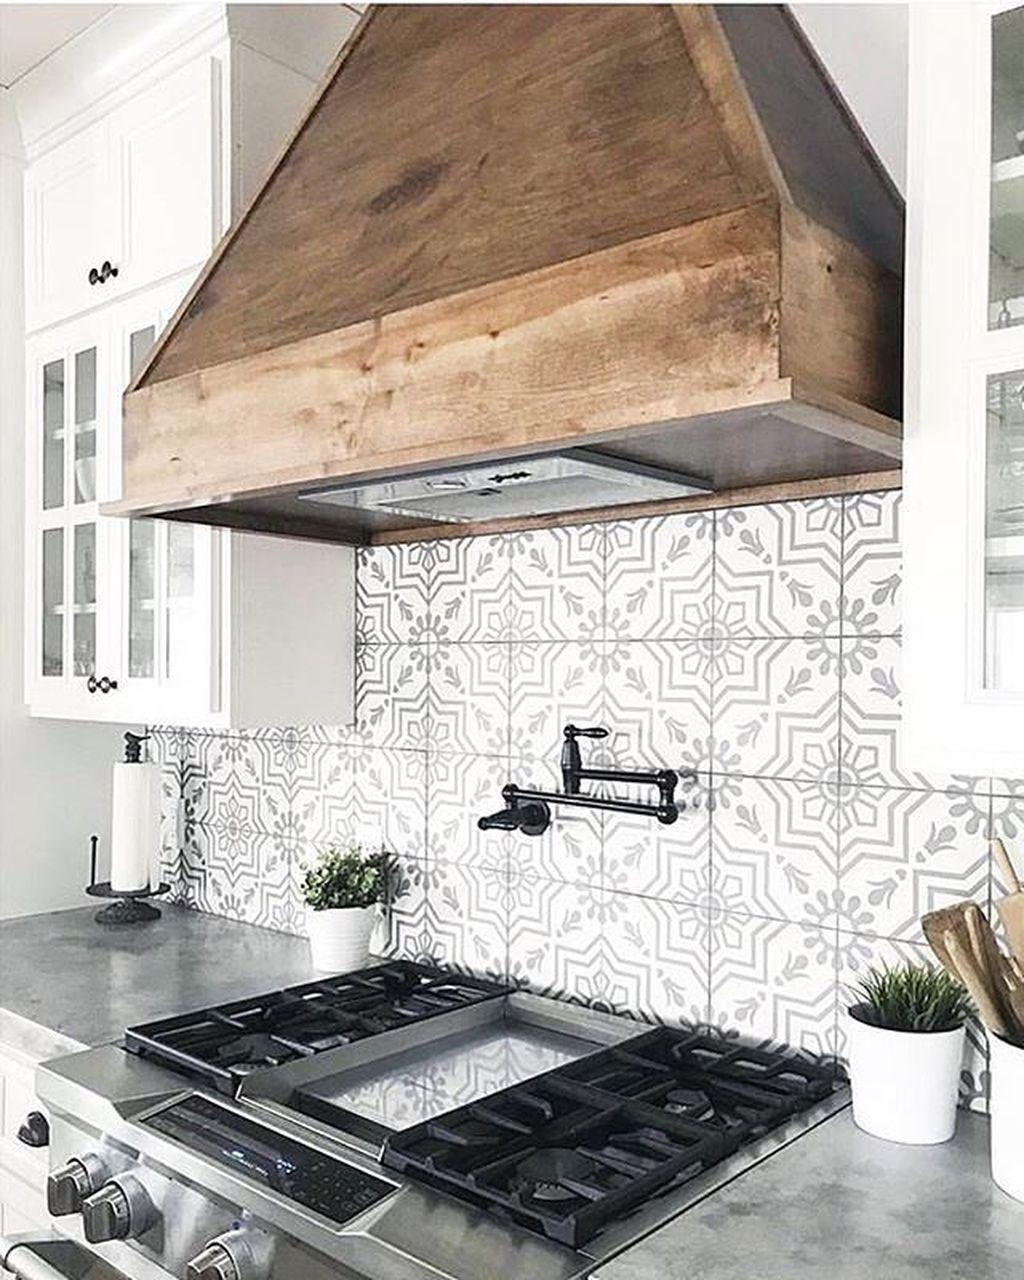 48 Cool Modern Farmhouse Kitchen Backsplash Ideas Luvlydecor